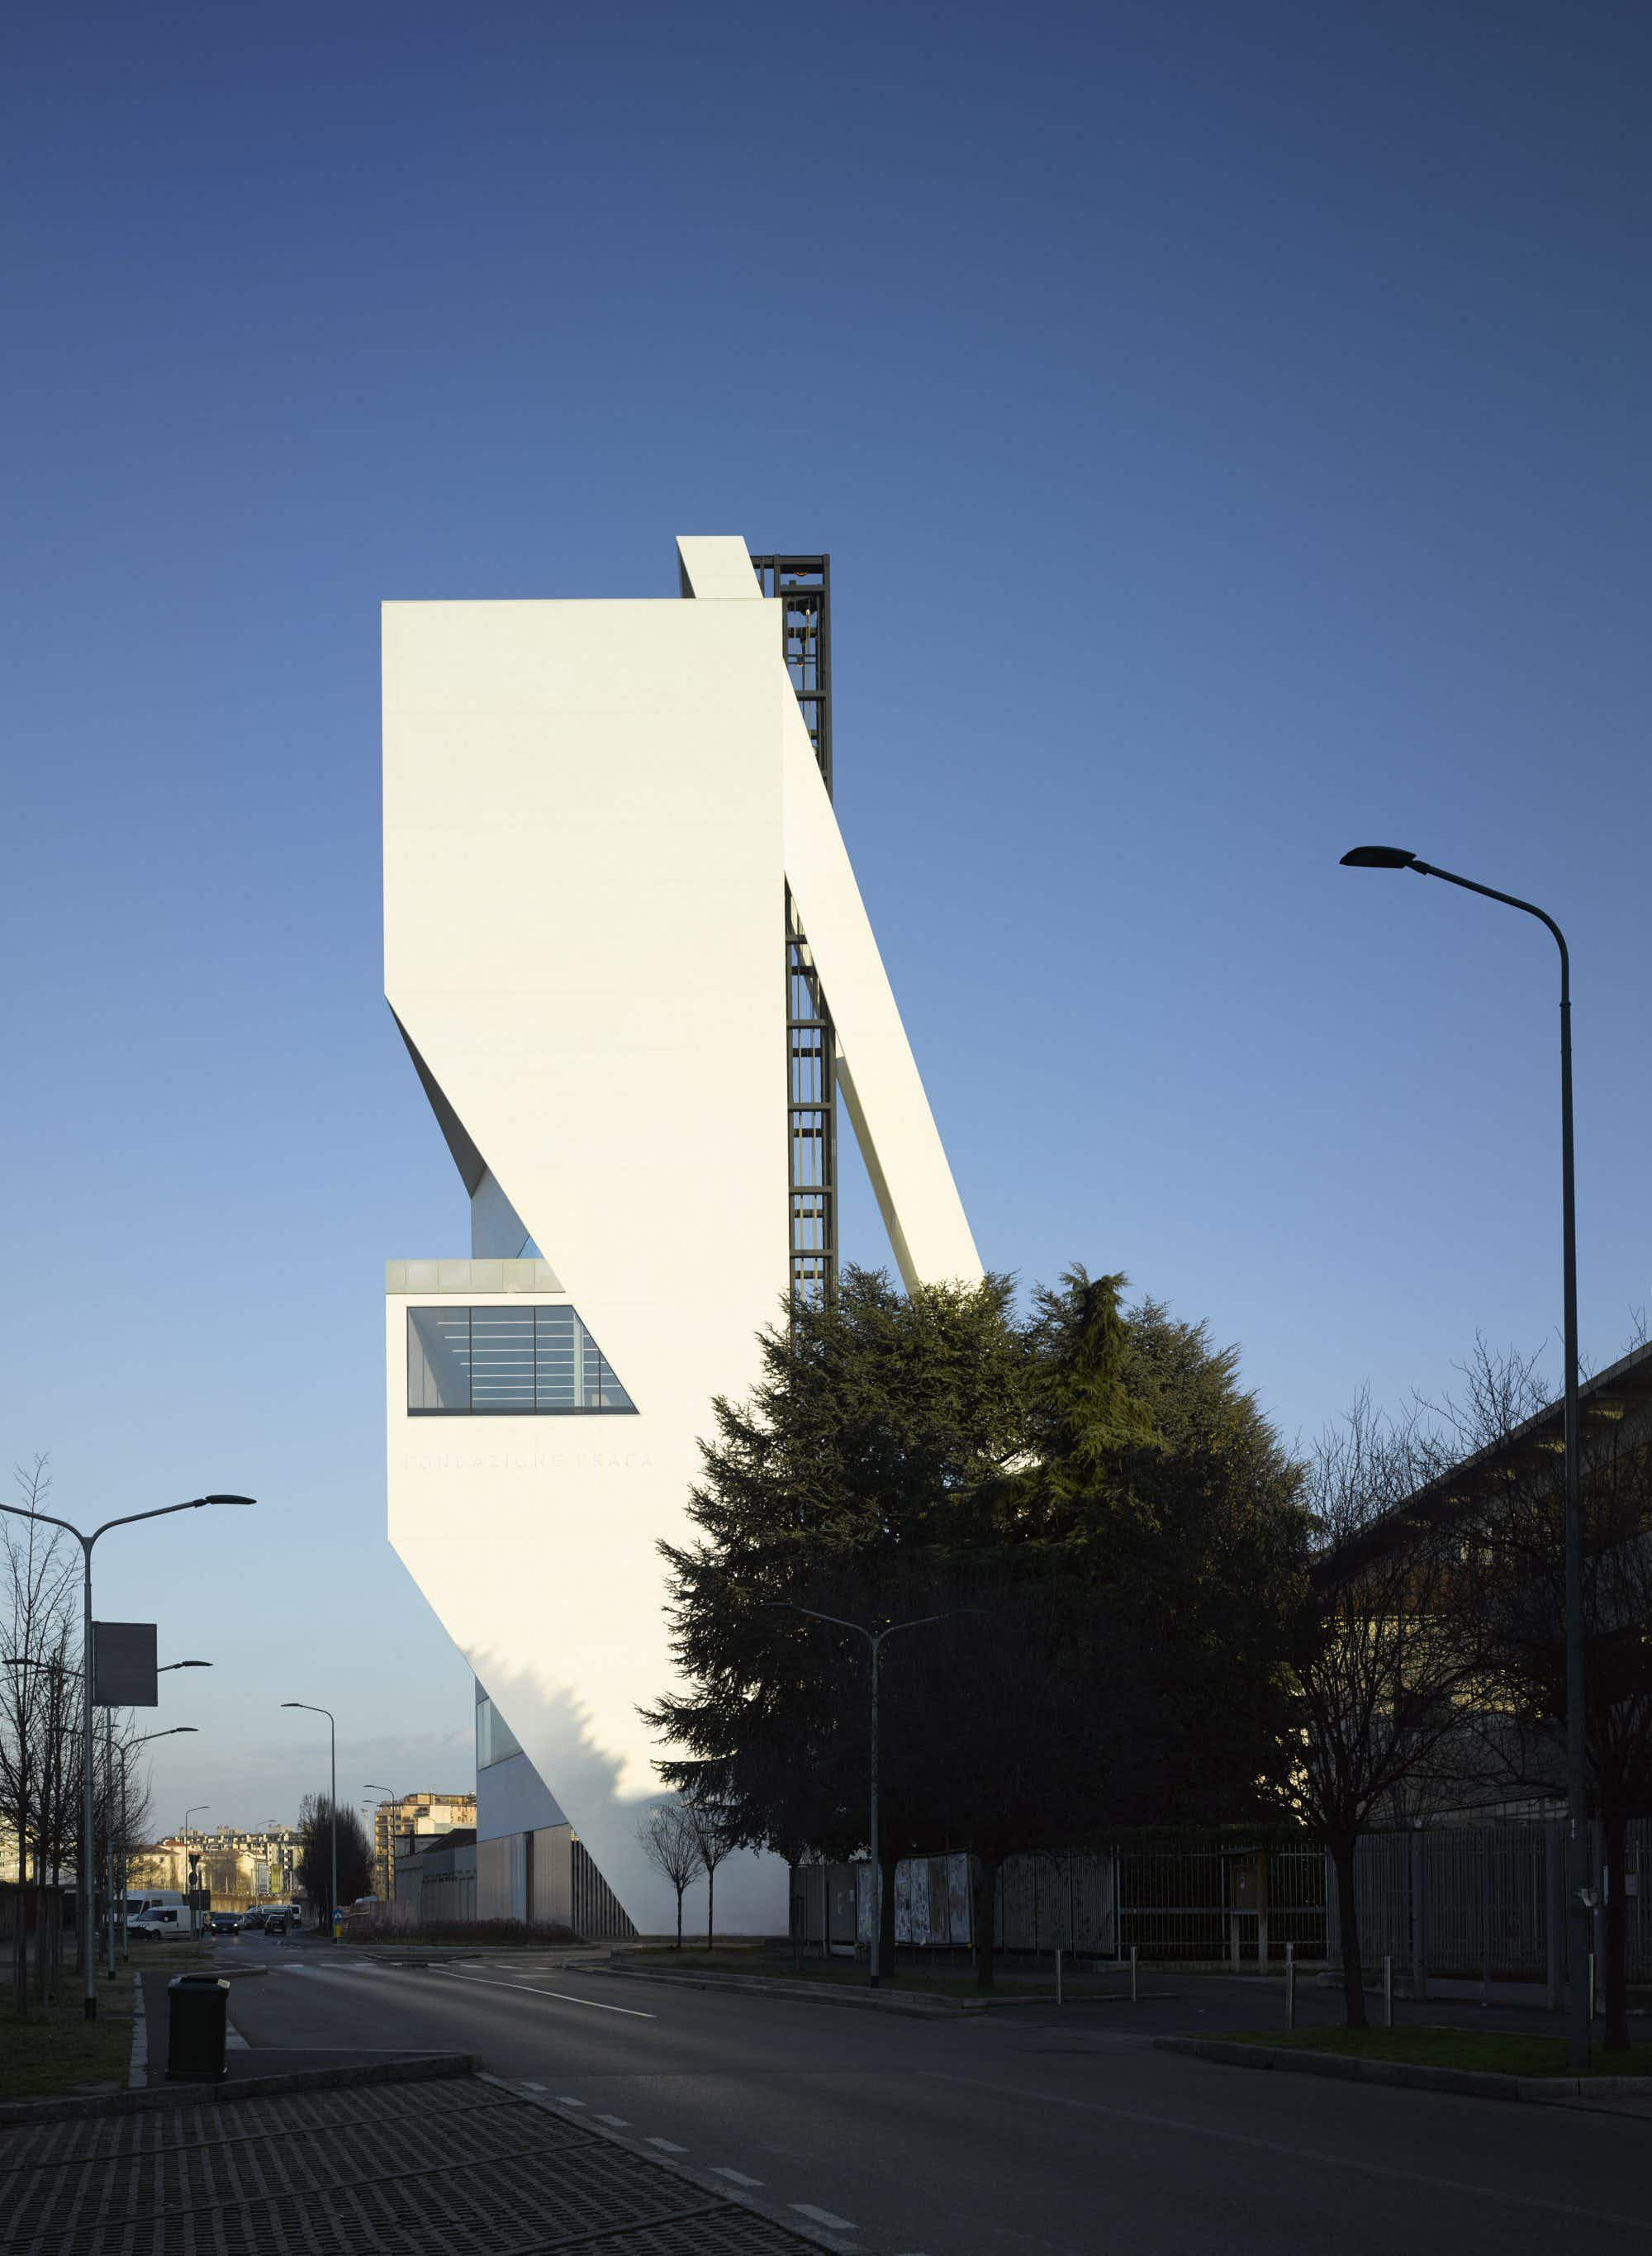 Milan's elegant Torre at Fondazione Prada nears completion